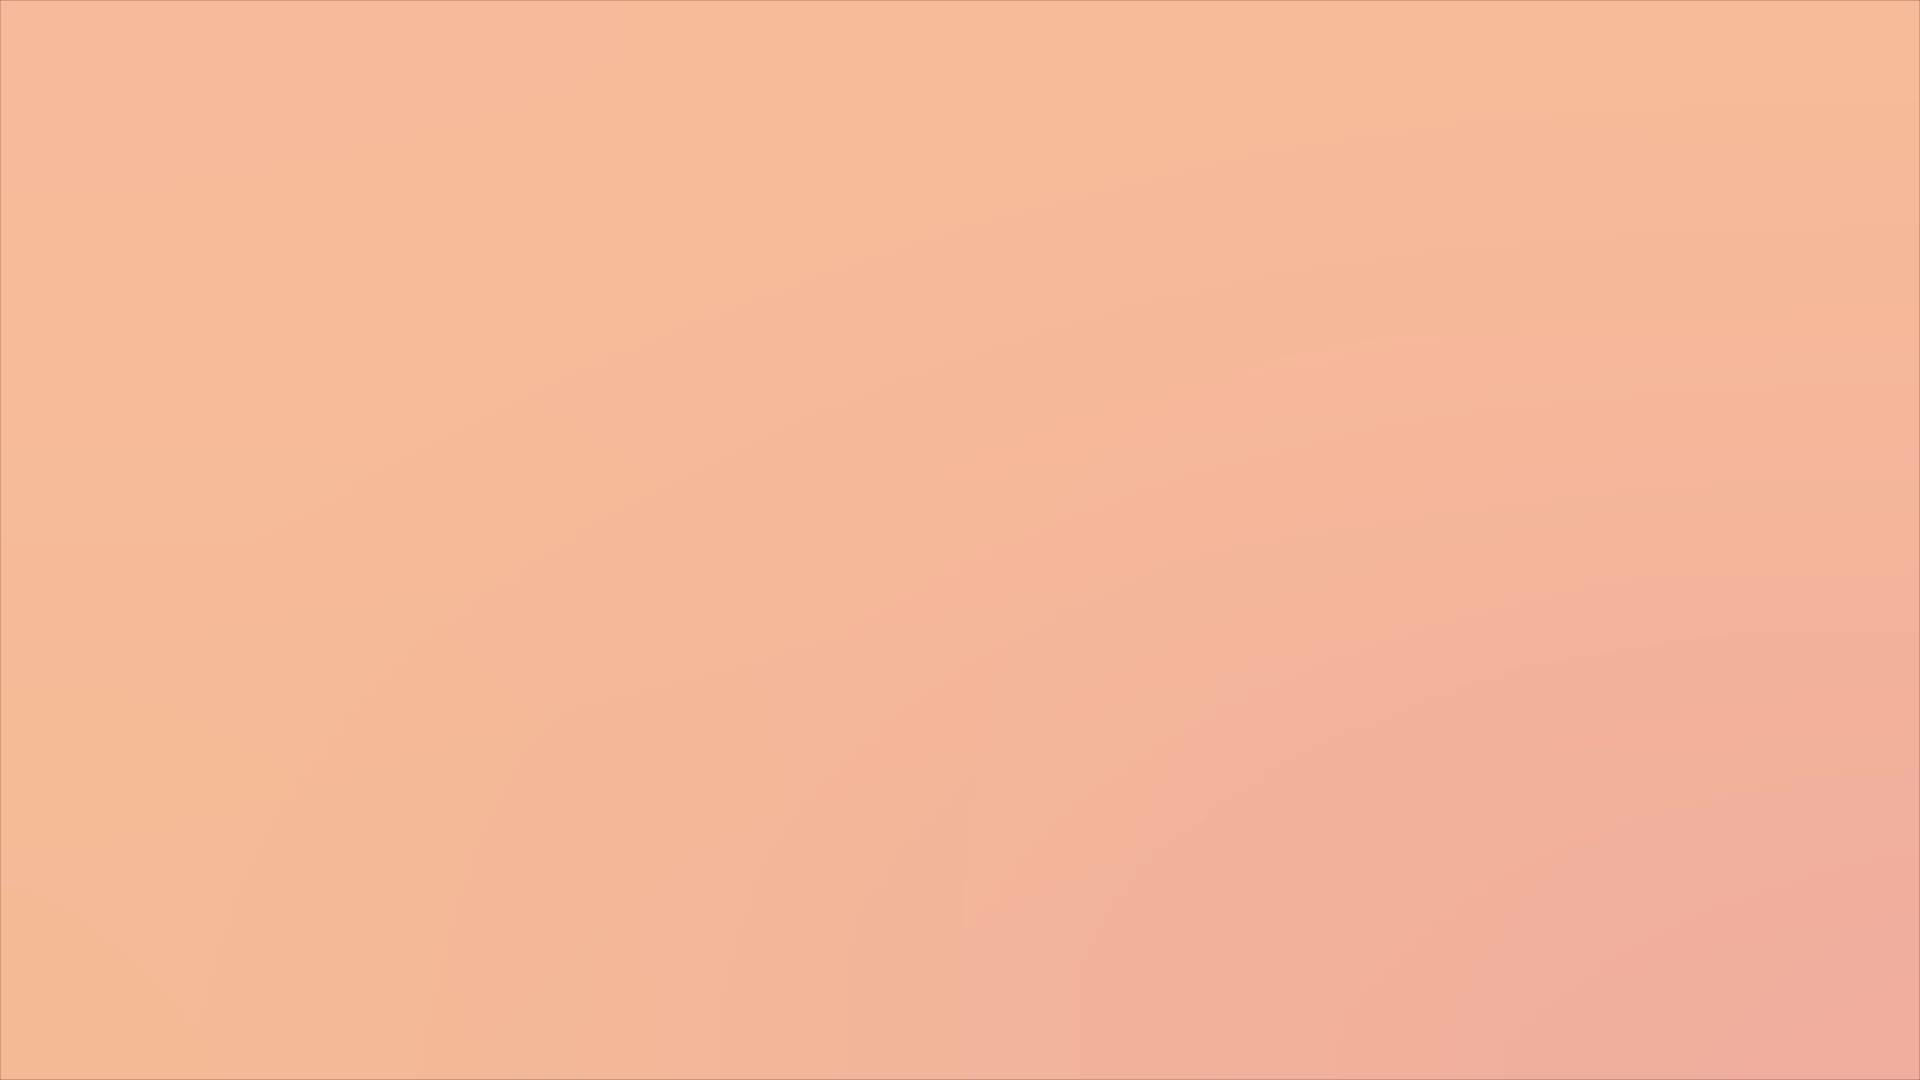 IMAGIC water-resistant blush palette custom private logo label blush tray easy to apply blush pressed powder